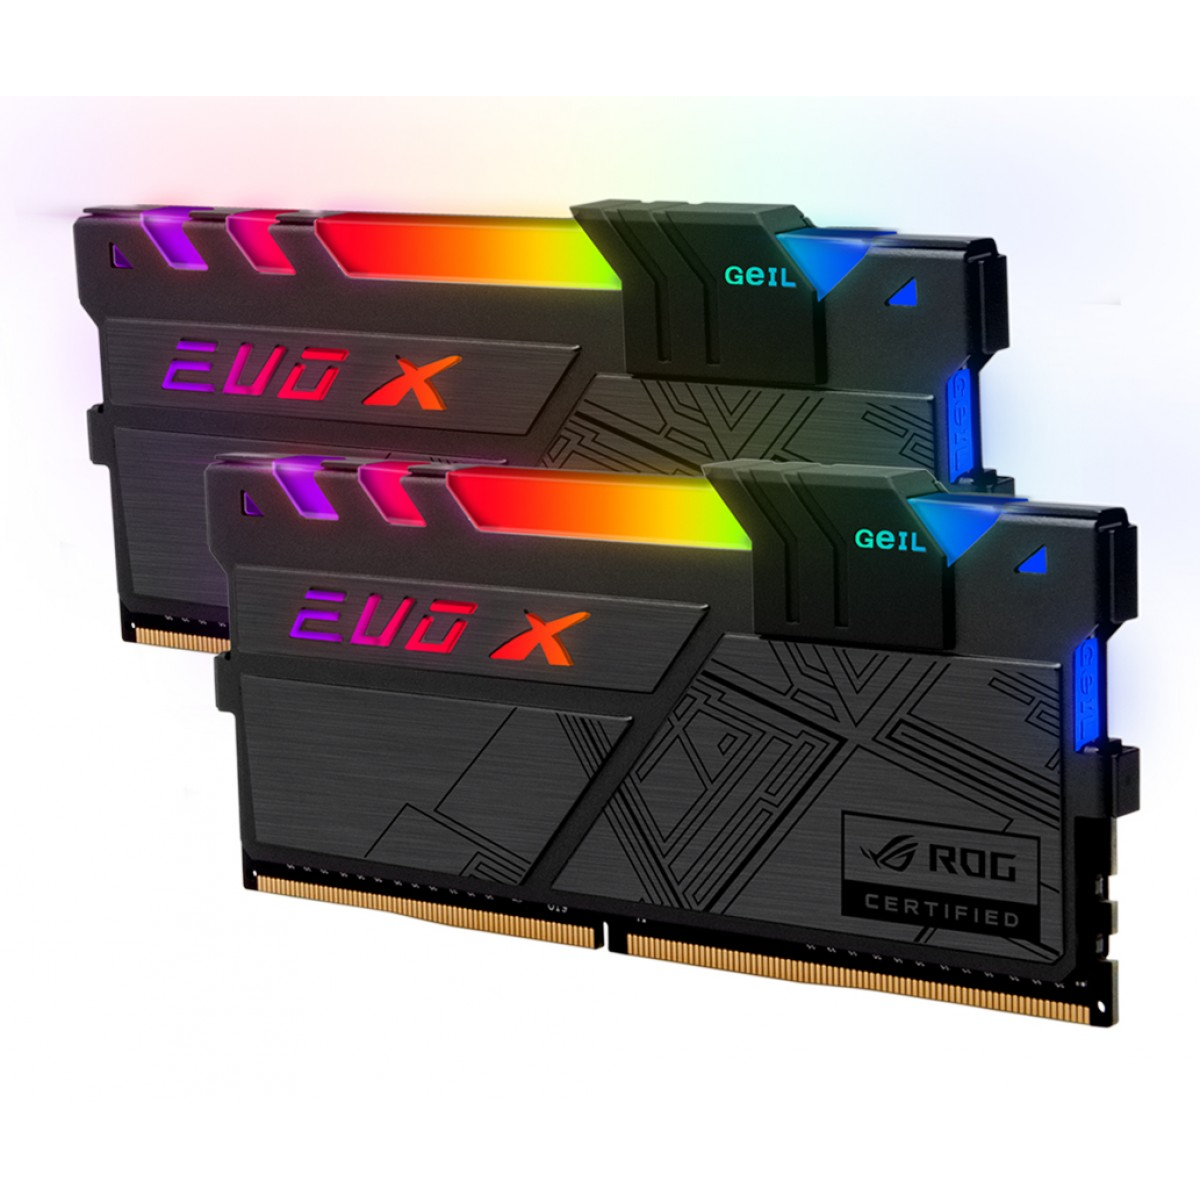 Memória DDR4 Geil EVO X II RGB, 16GB (2x8GB) 3600MHz, ROG CERTIFIED, Black, GREXSR416GB3600C18ADC